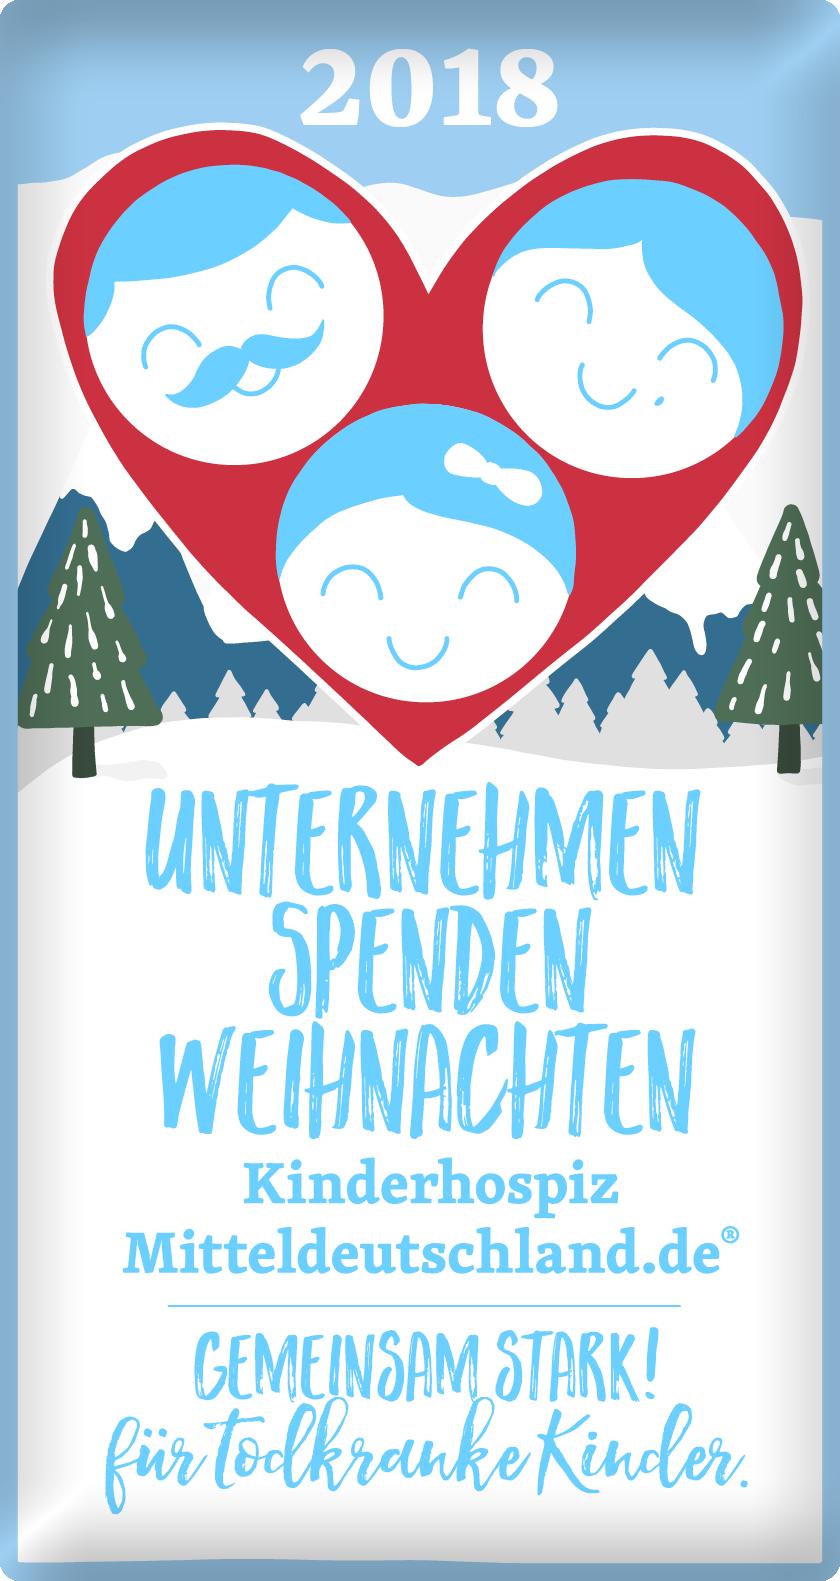 Samt&Seidel_Referenz_Antenne_Thueringen_Weihnachtsengelaktion_Design_07